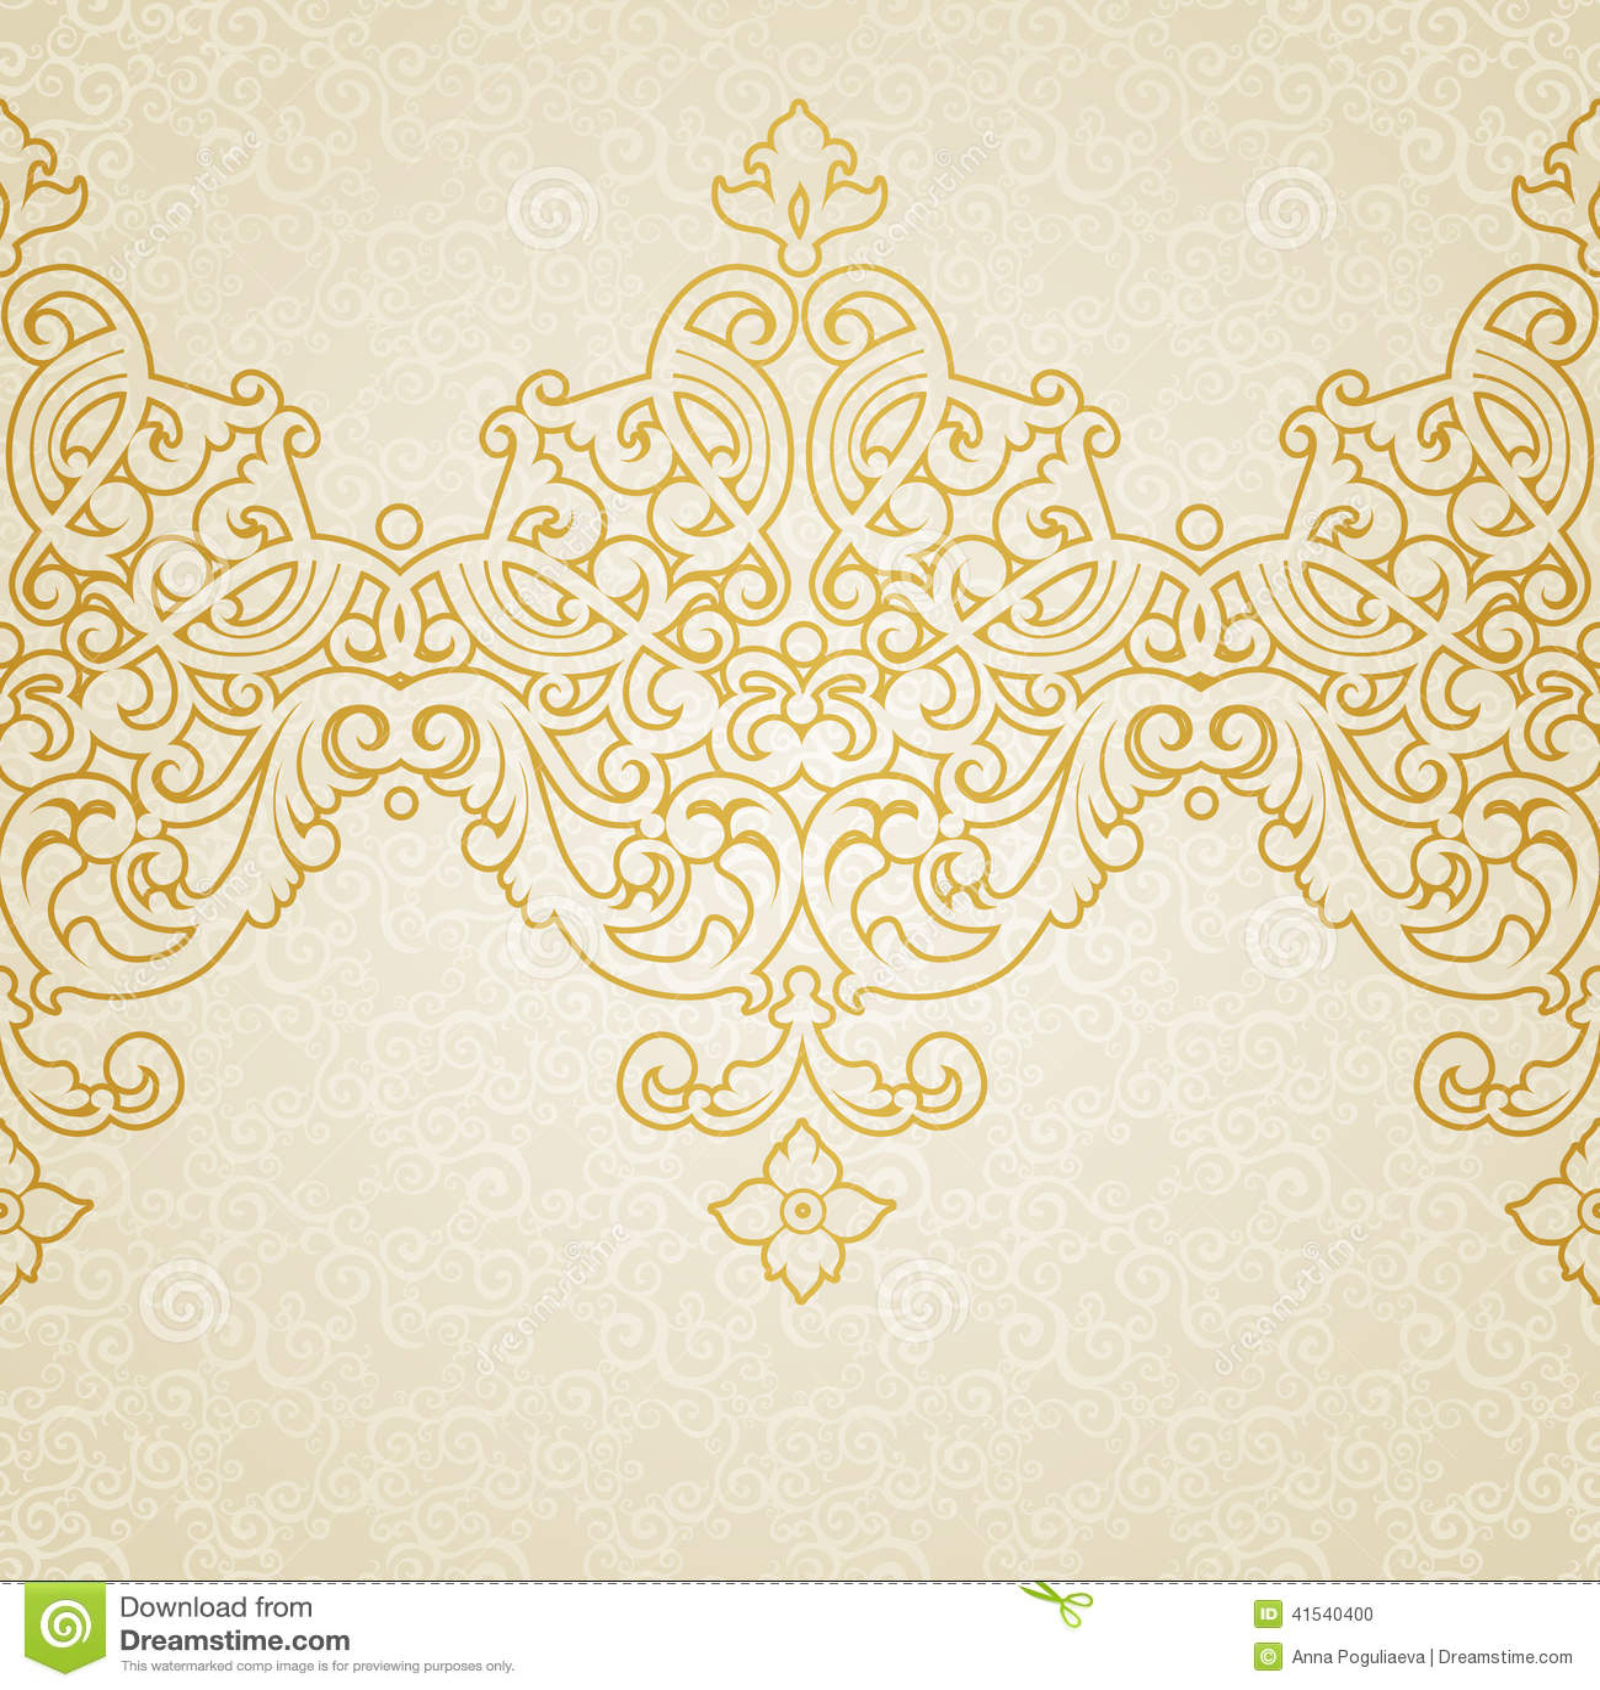 Vintage baroque floral golden ornament vector stock vector image - Vector Ornate Border In Victorian Style Stock Vector